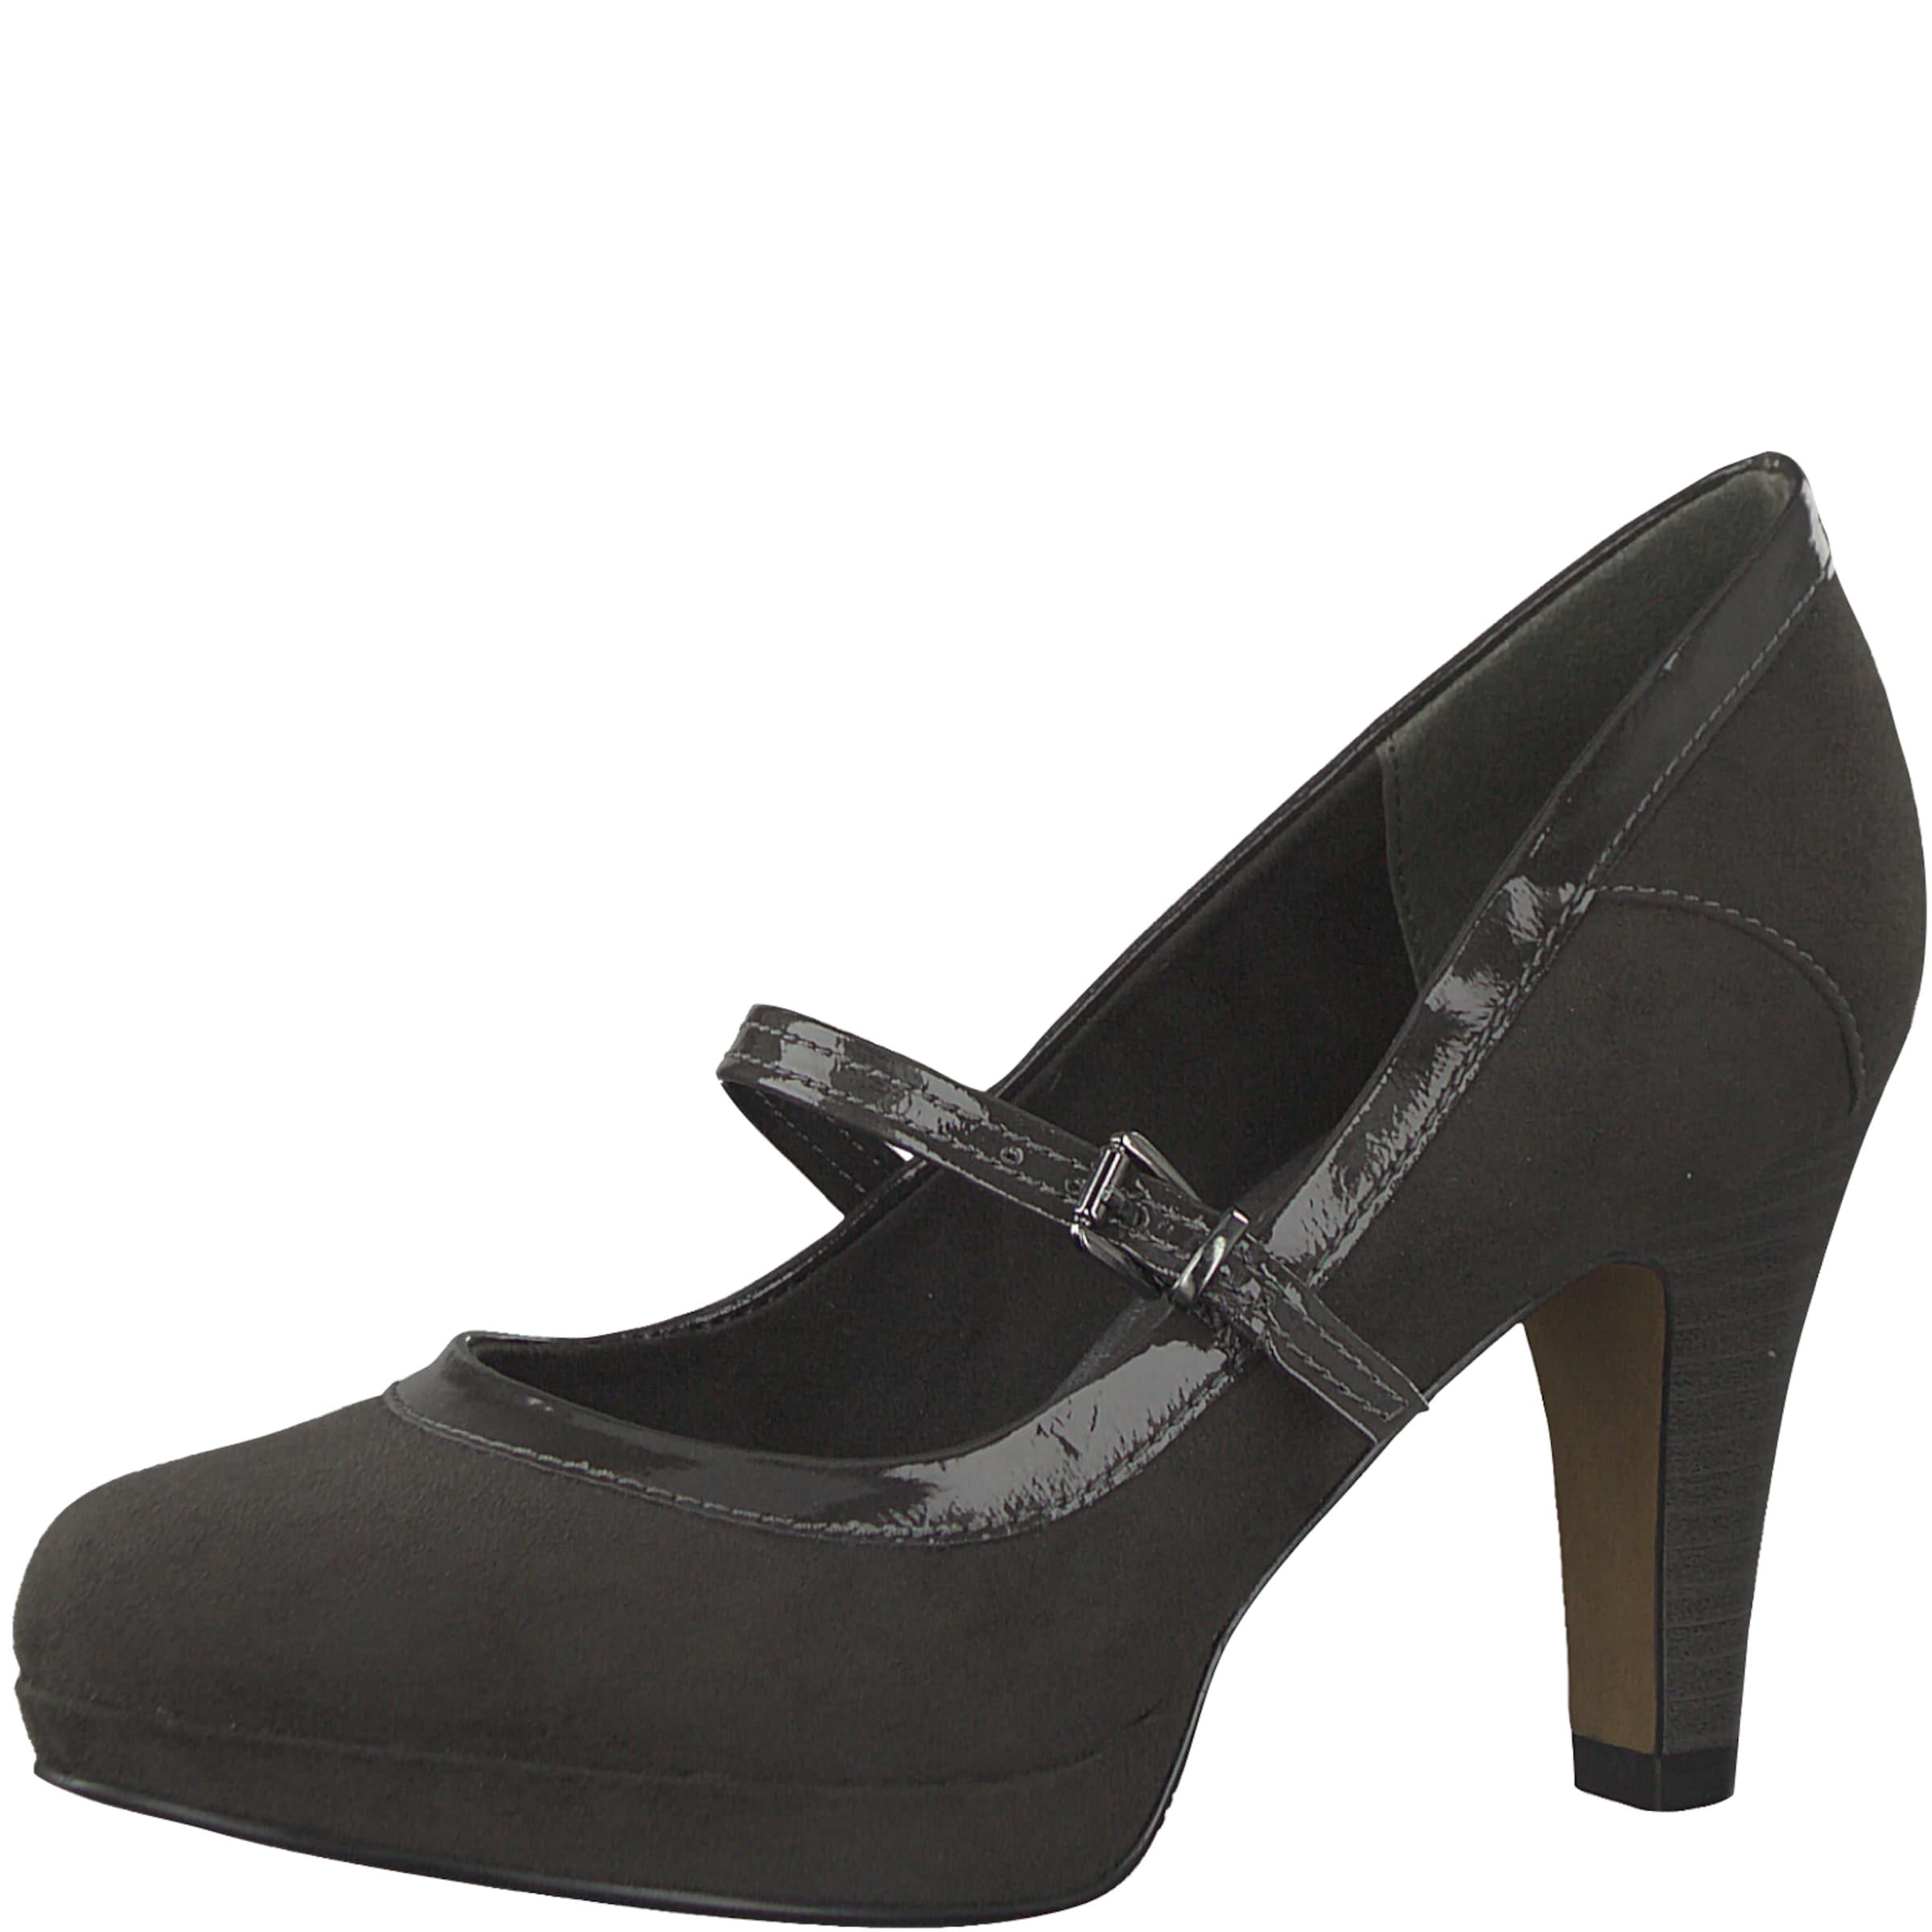 Haltbare Schuhe Mode billige Schuhe s.Oliver RED LABEL | Pumps Schuhe Haltbare Gut getragene Schuhe b64d23